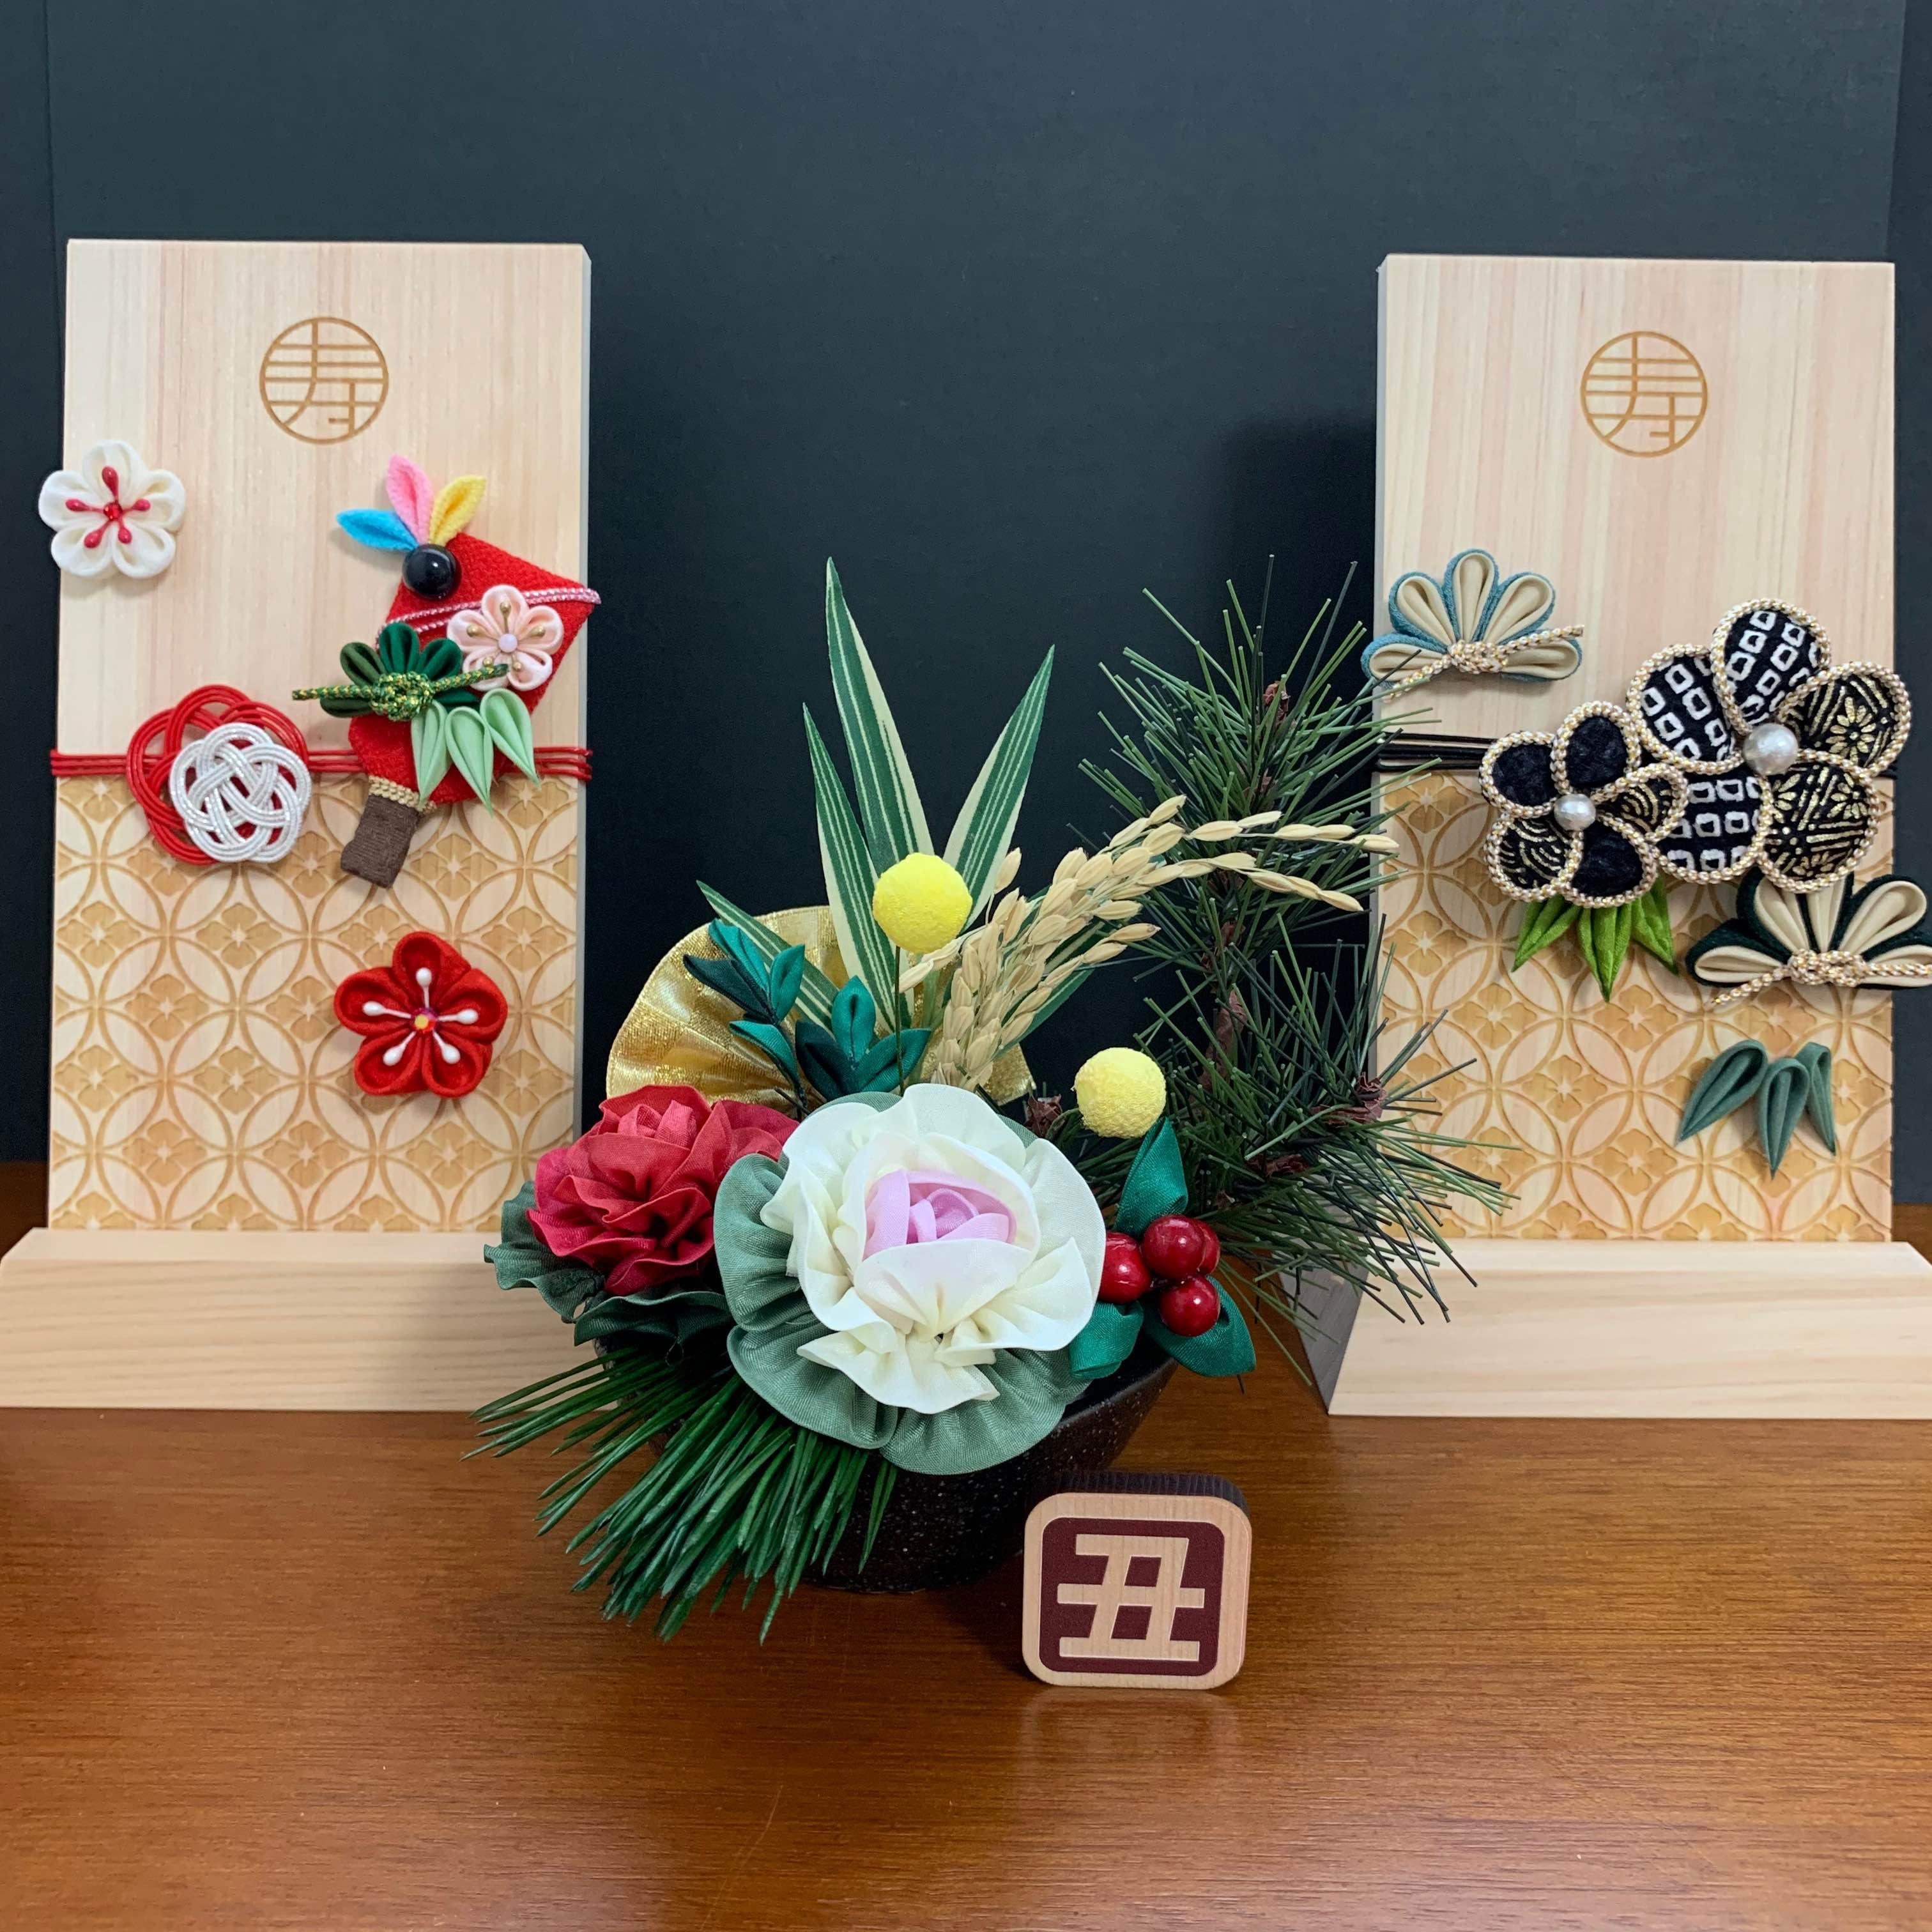 nana-hanaつまみ細工 日進市竹の山